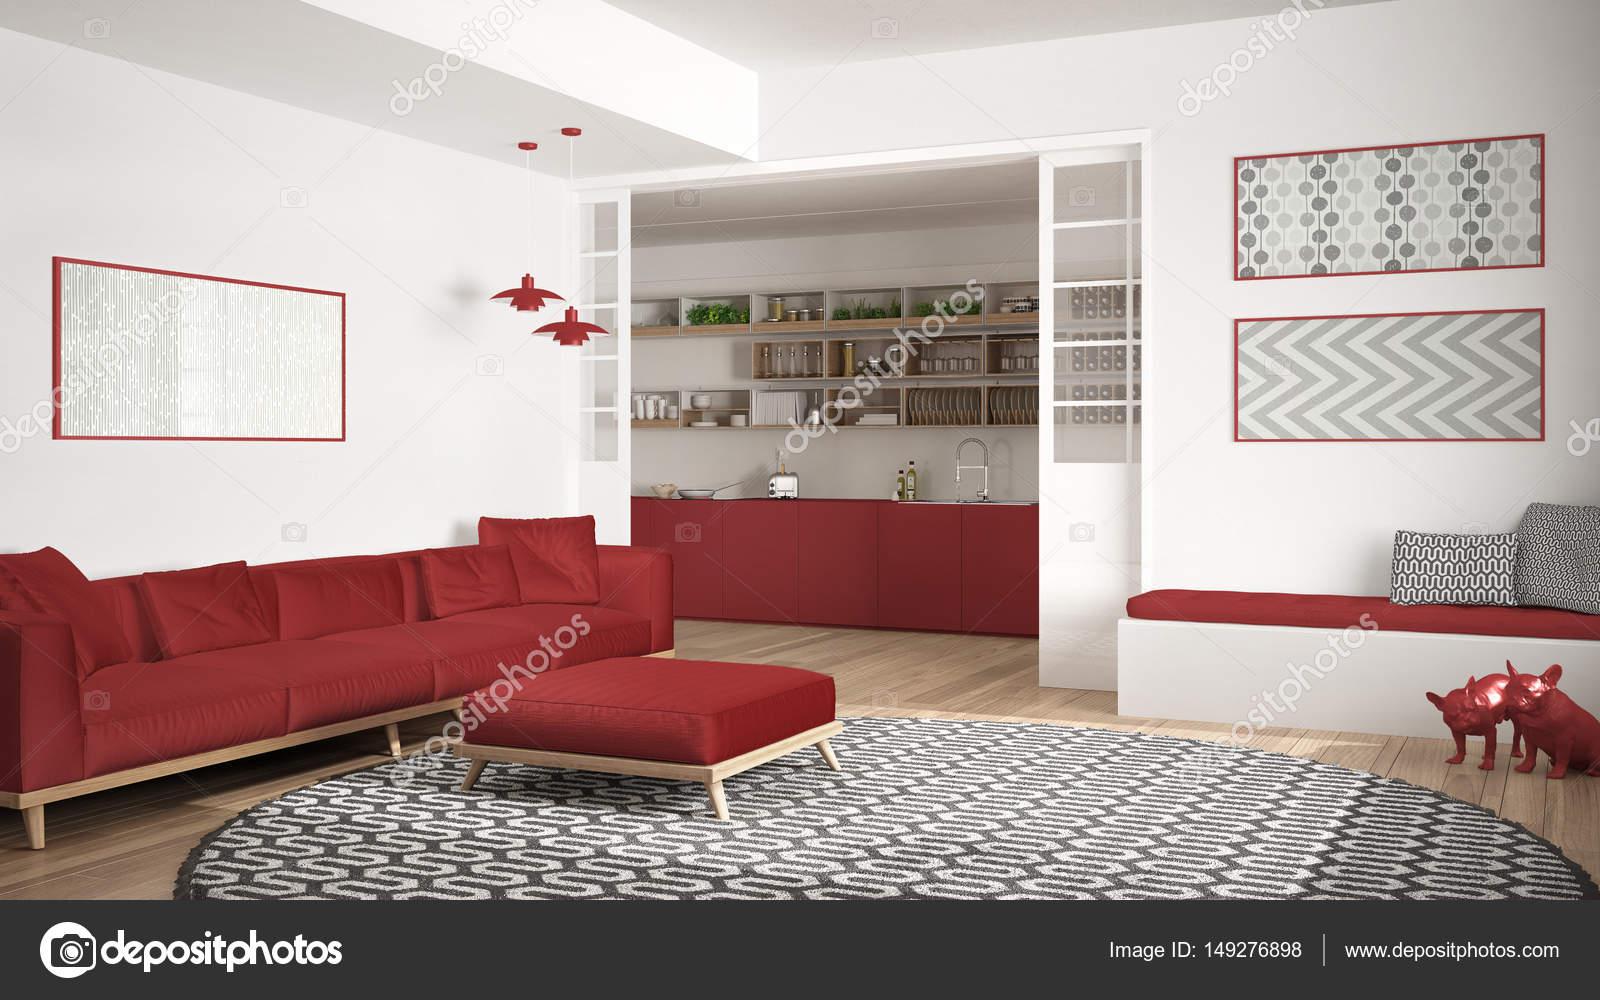 large kitchen rug aid washer 极简主义生活一会议室的沙发上 又大又圆的地毯和厨房 图库照片 极简主义客厅的沙发上 又大又圆的地毯和背景 白色和红色的现代室内设计中的厨房 照片作者archiviz